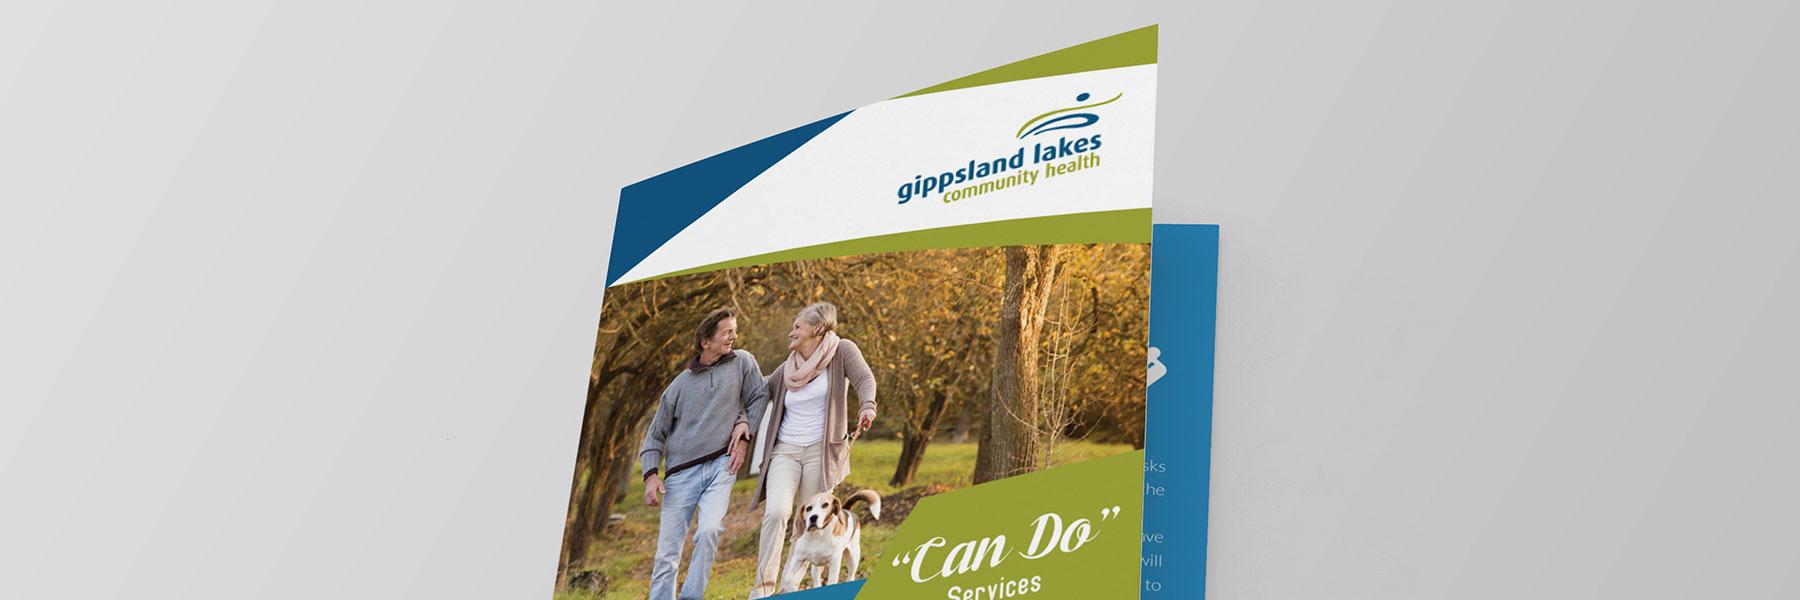 Gibbsland lake